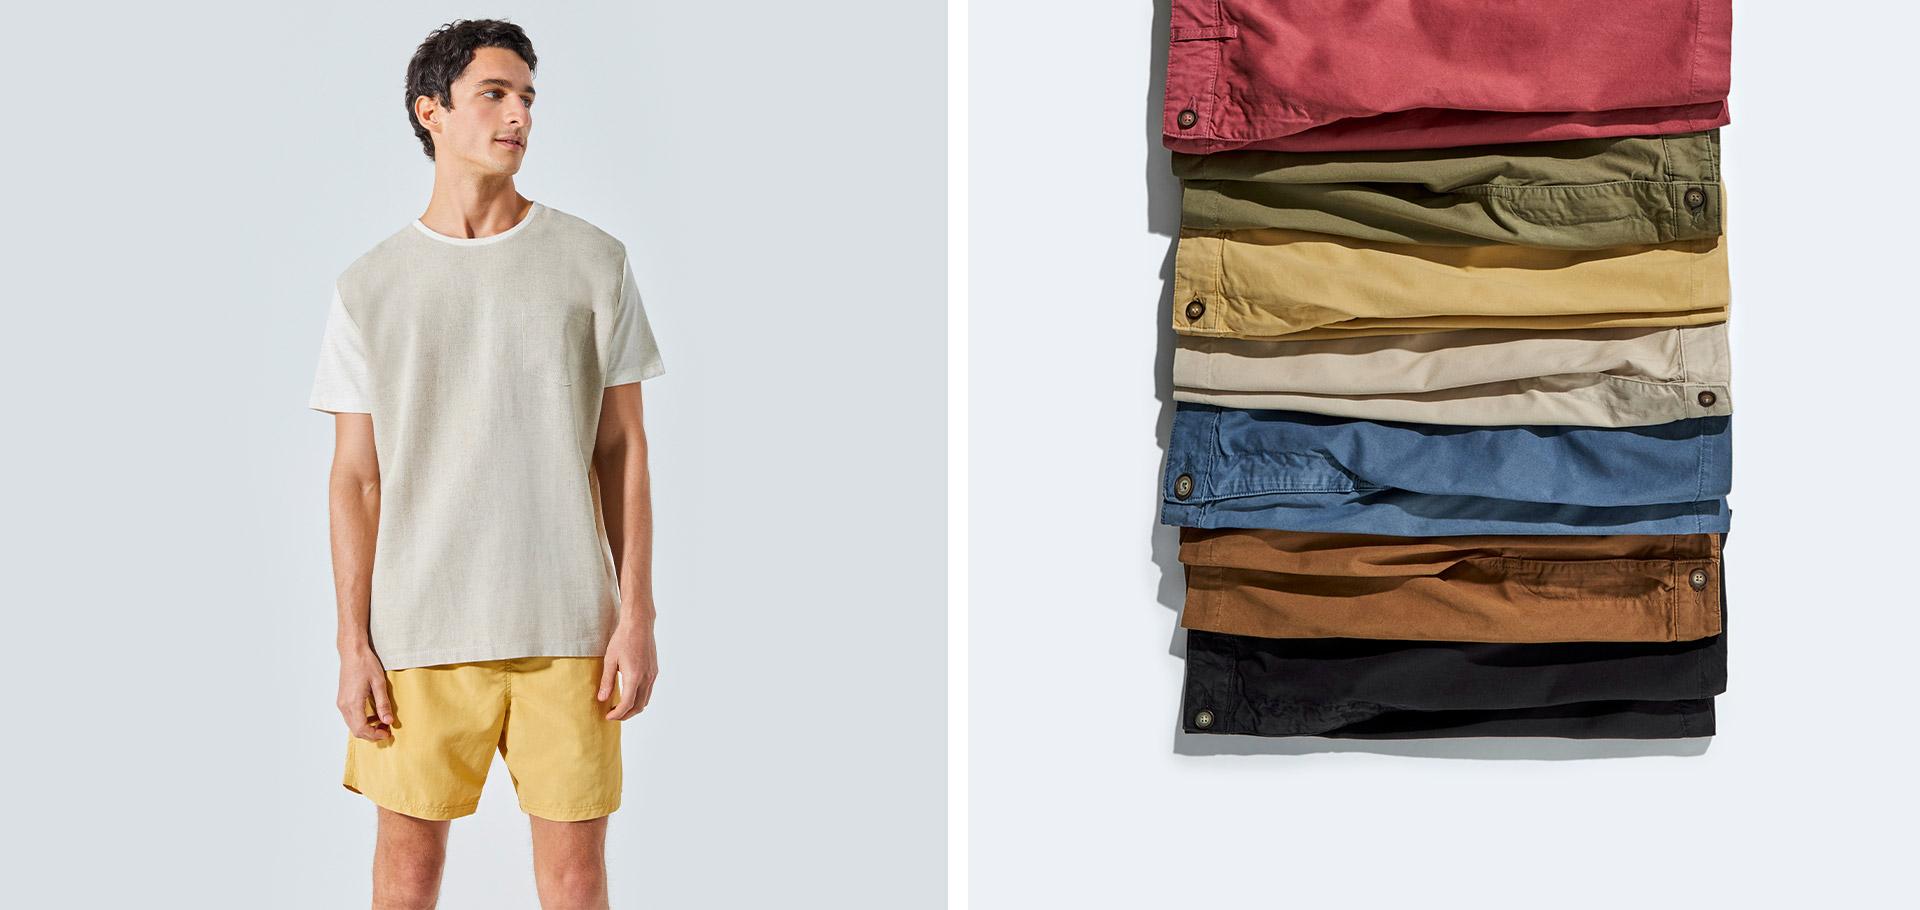 1 - Bermudas/Shorts